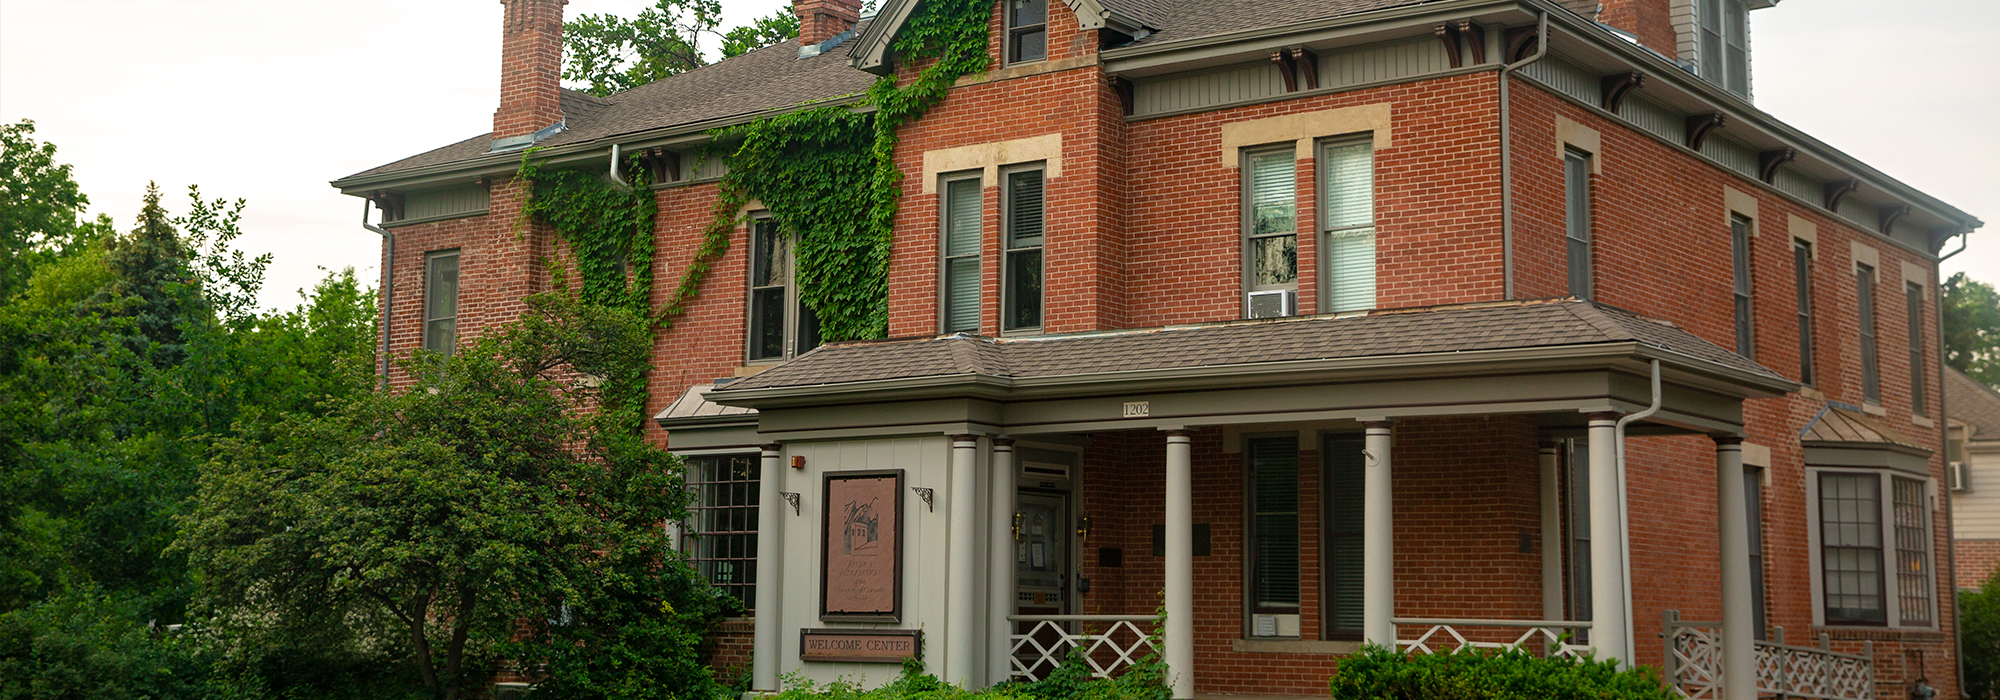 Visit Koenig Building on an Alumni campus trip